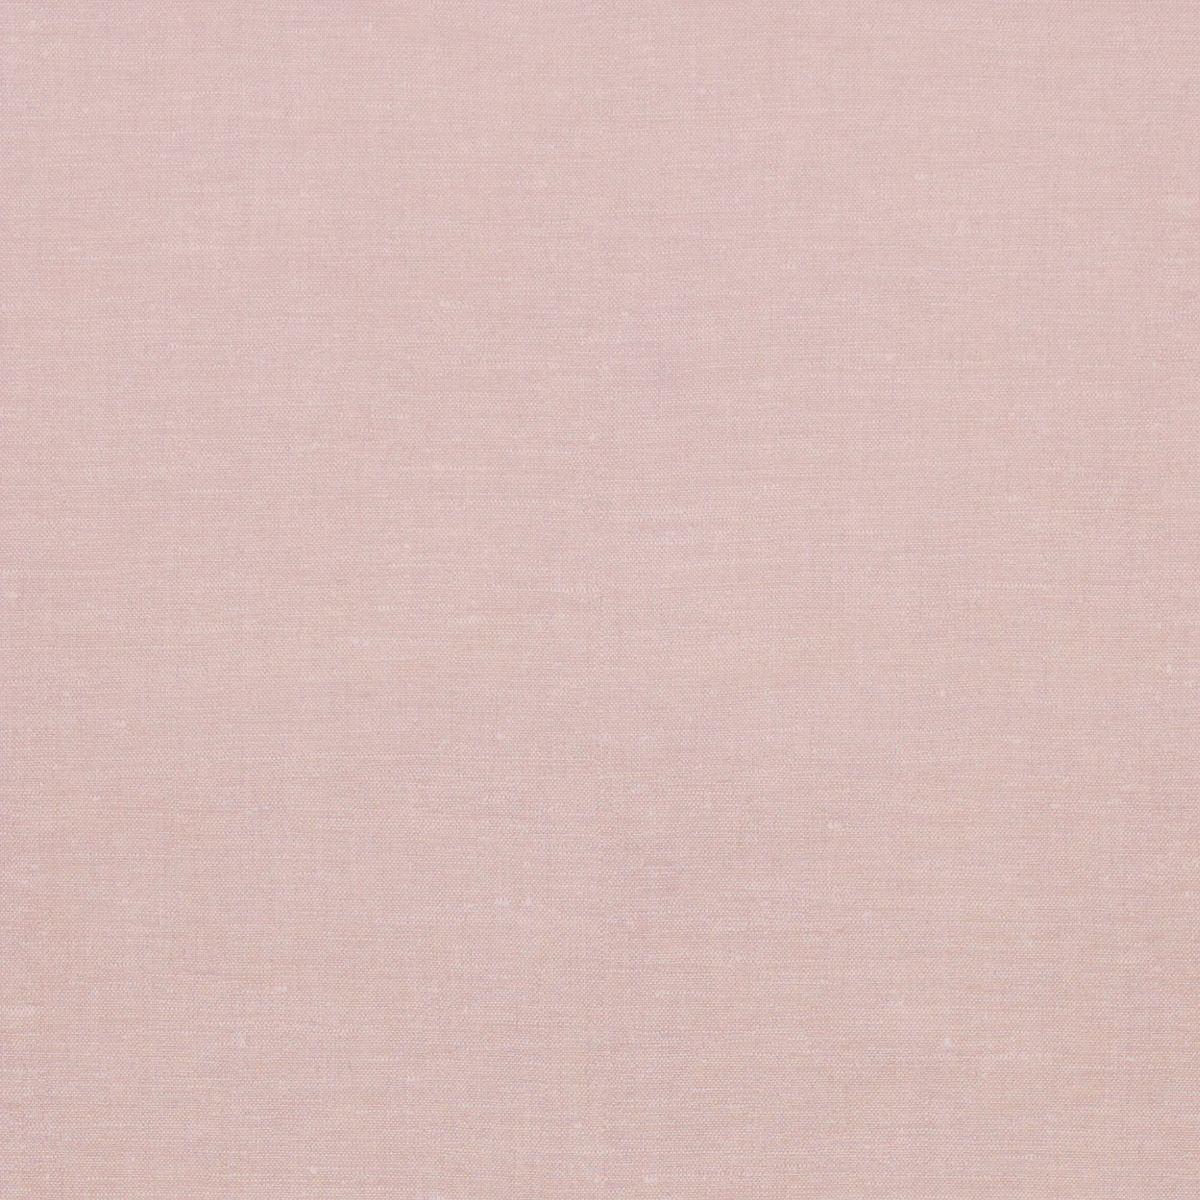 hochwertige tapeten und stoffe b n wallcoverings vliestapete riviera maison 18342 decowunder. Black Bedroom Furniture Sets. Home Design Ideas